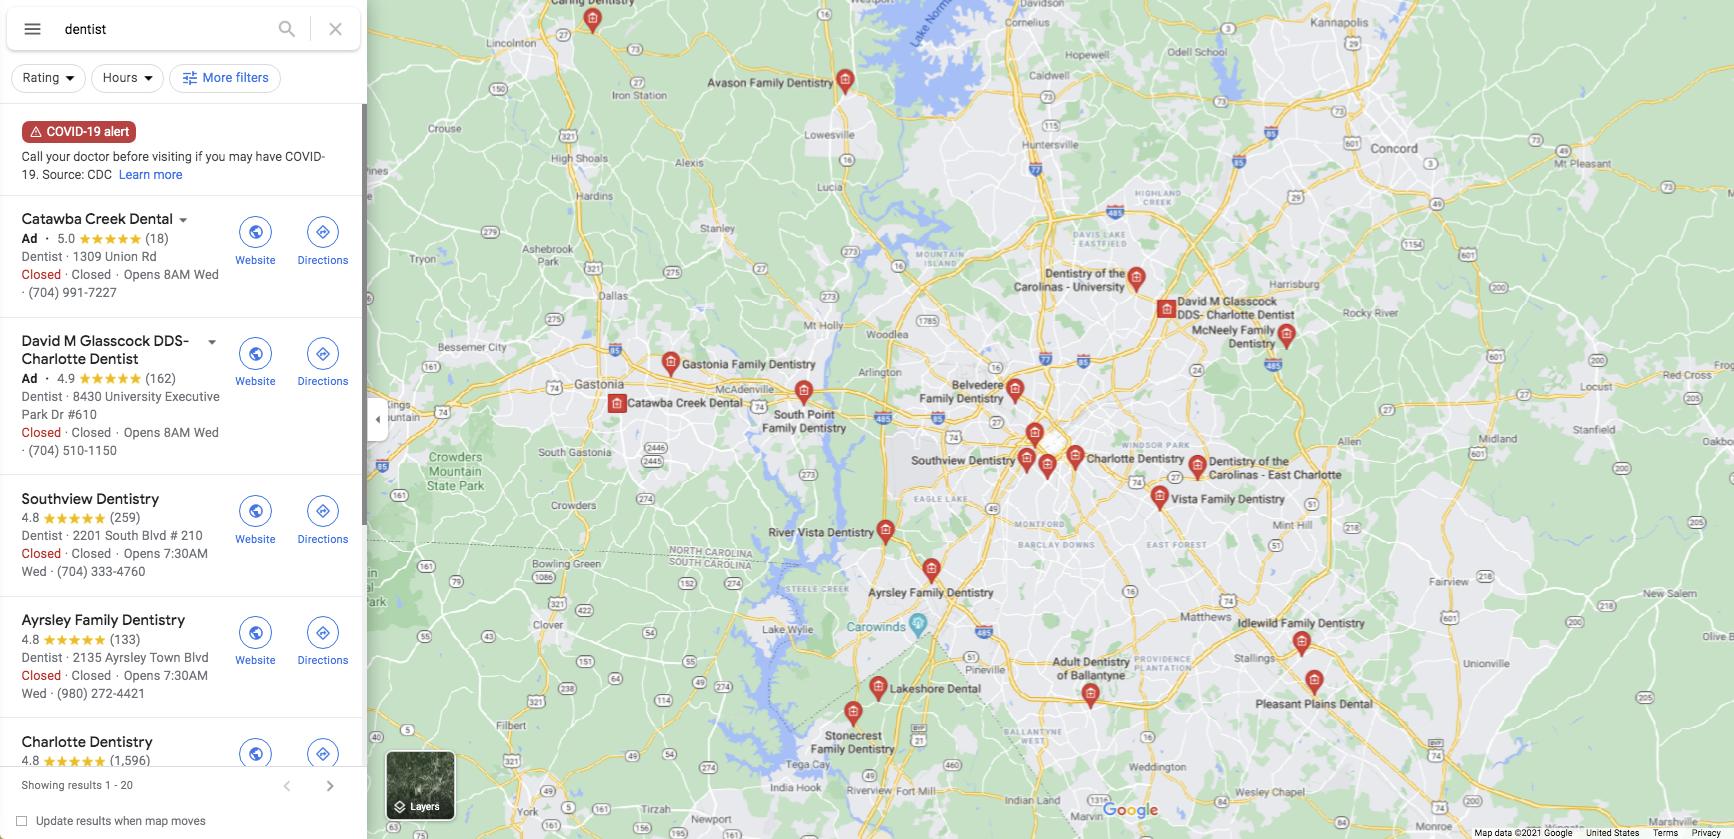 Multi-location Dental Groups in Charlotte